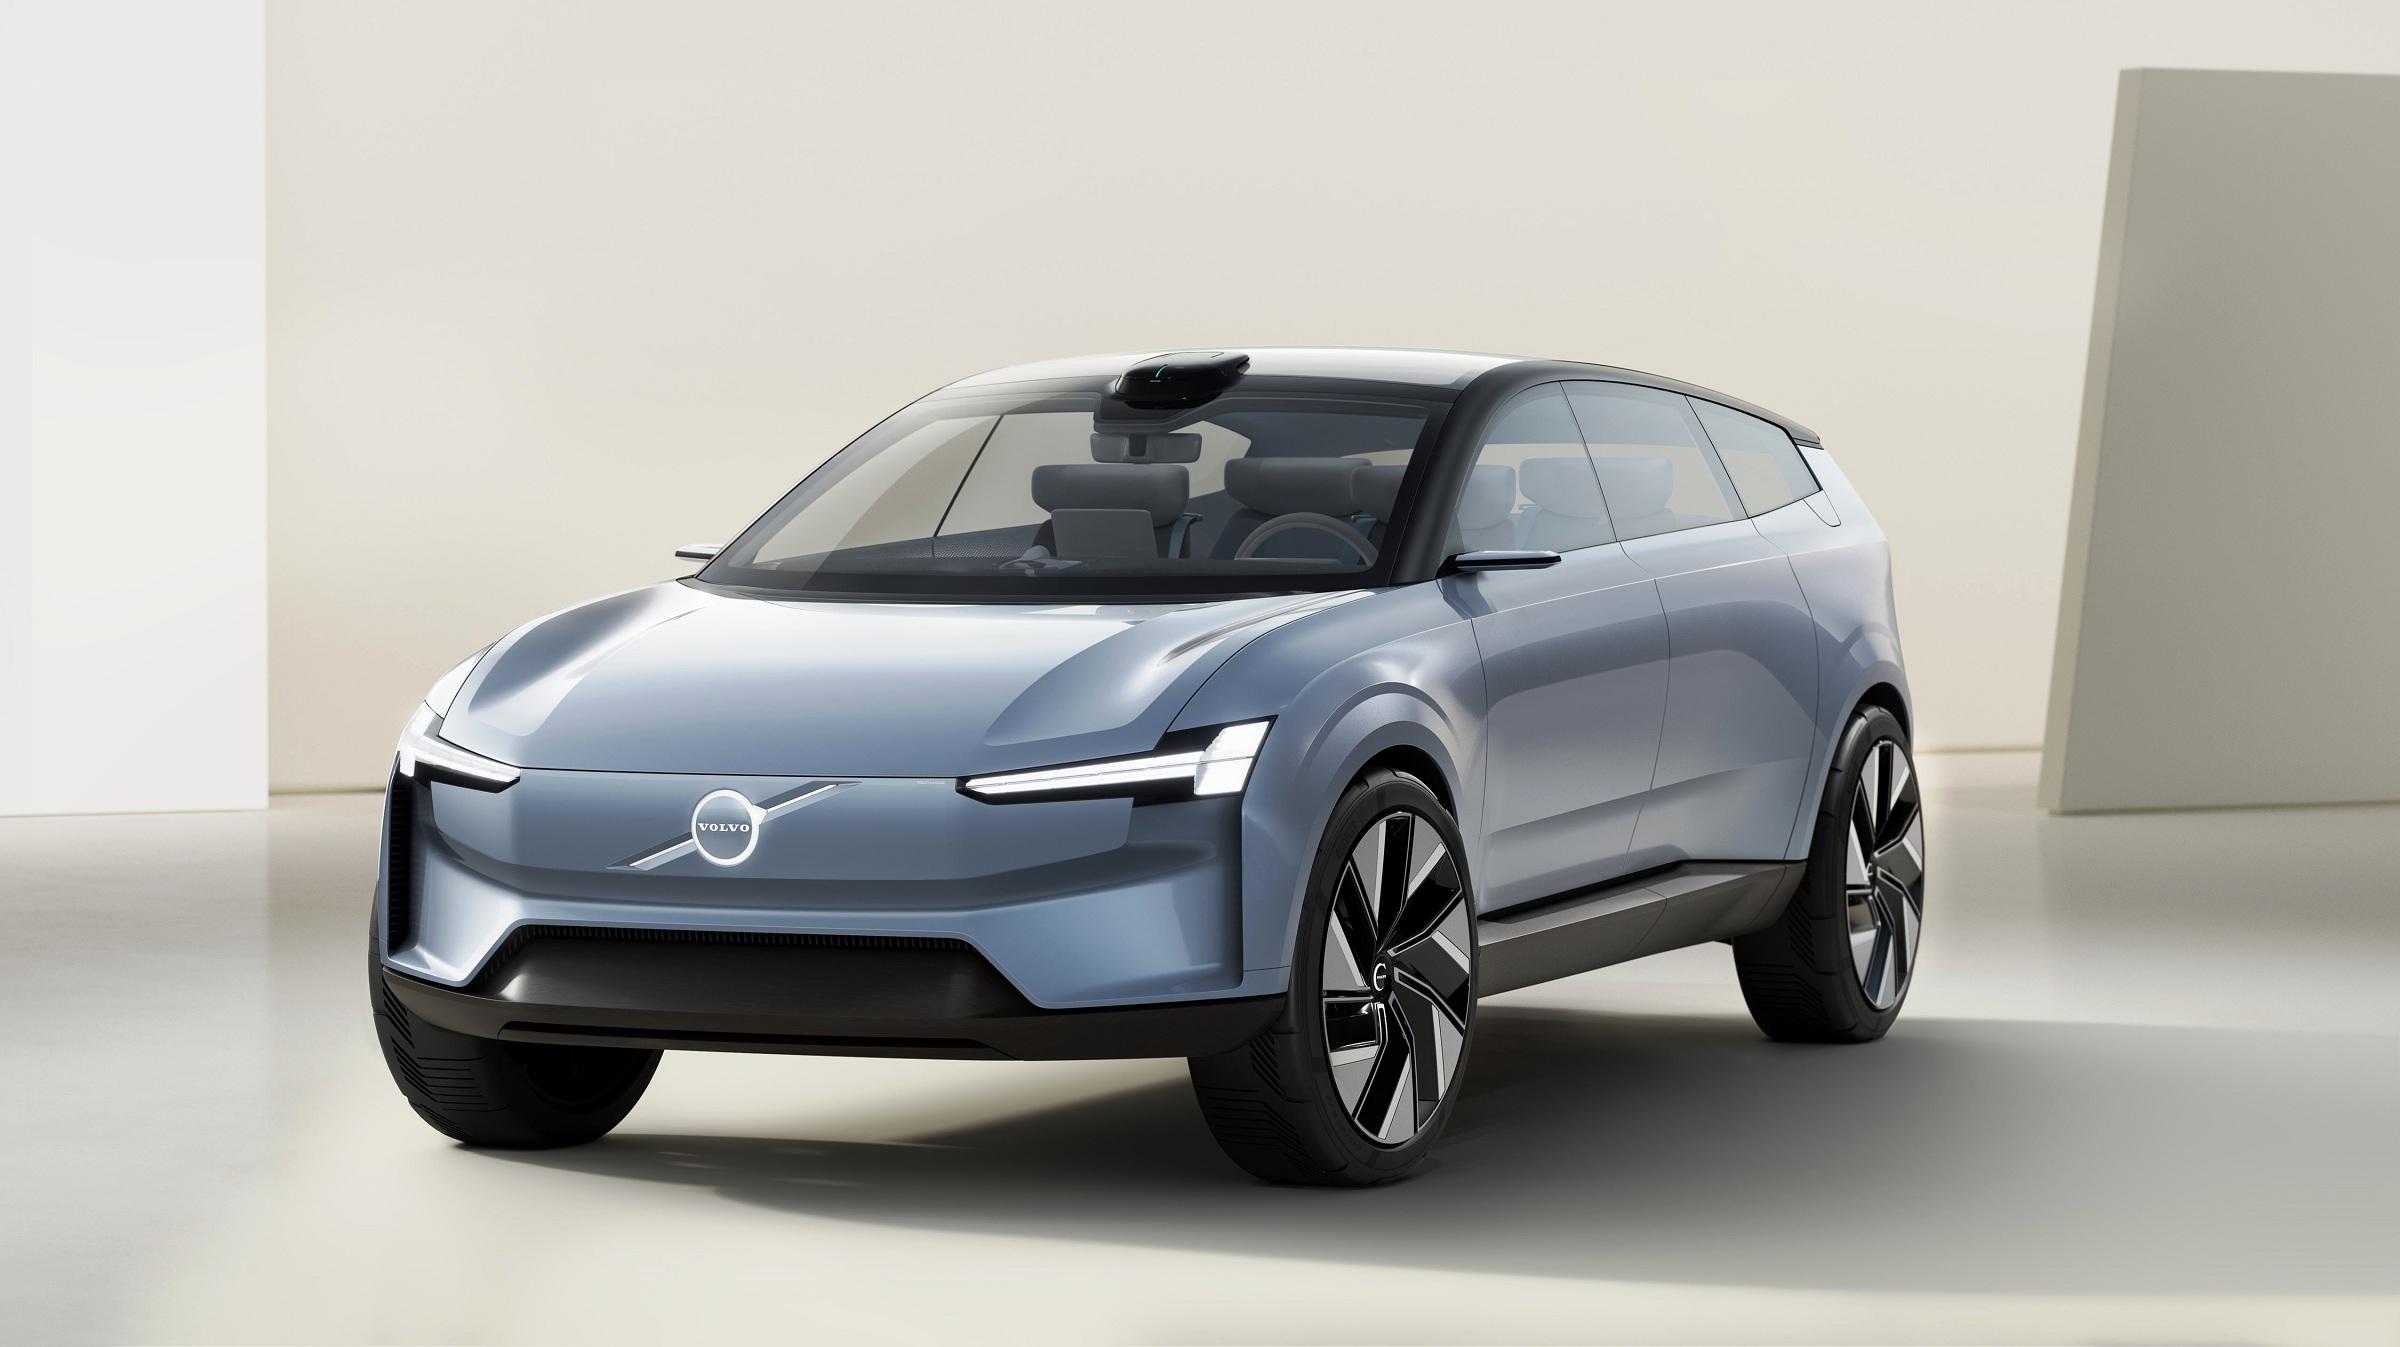 Carro-conceito da Volvo antecipa visual do novo XC90